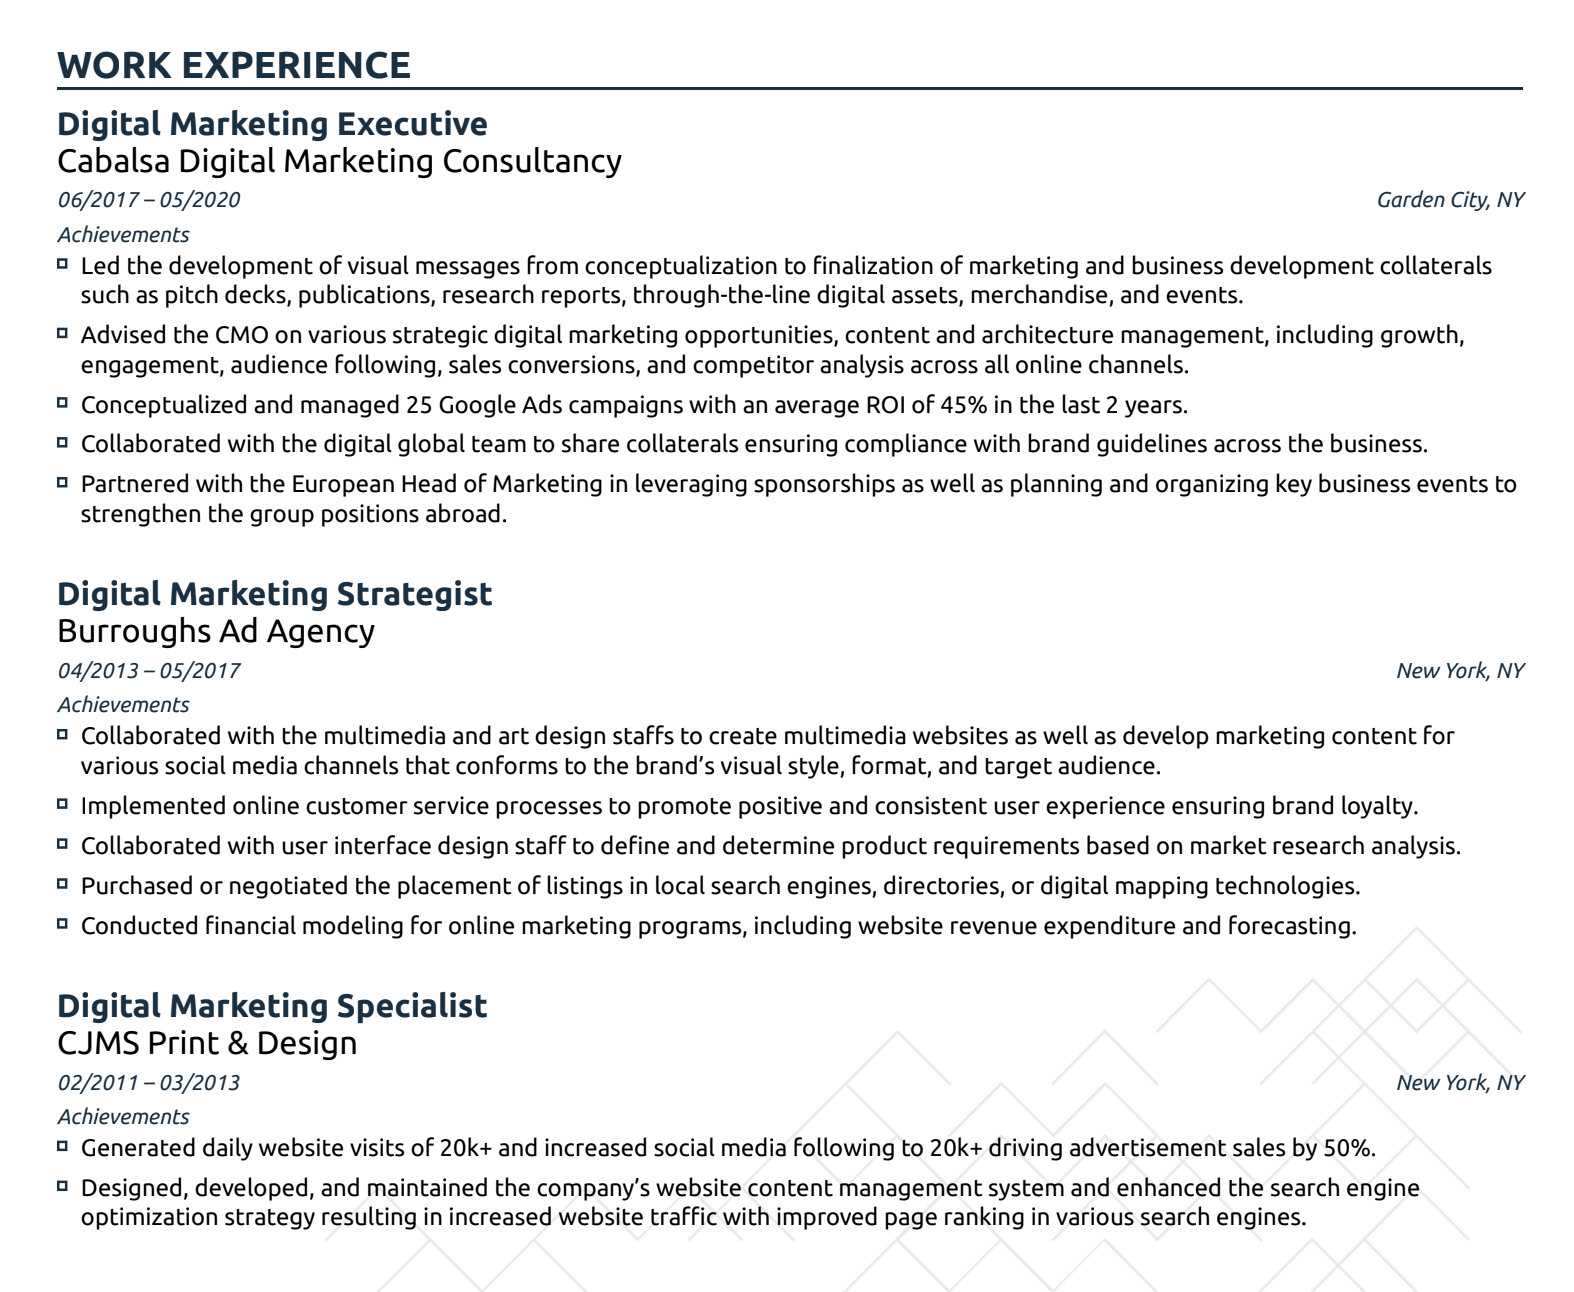 cv format work experience